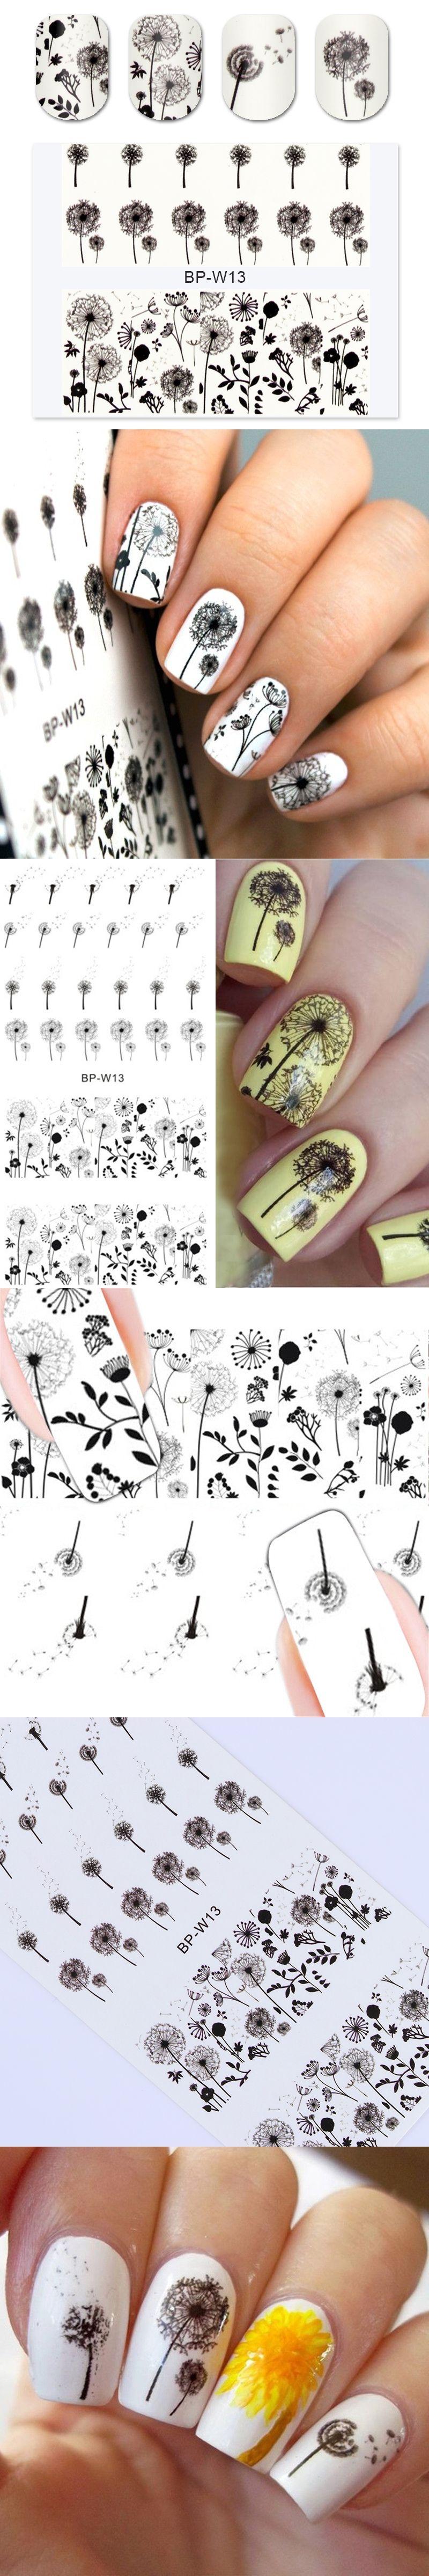 BORN PRETTY Flying Dandelion Nail Art Water Decals 2 Patterns ...